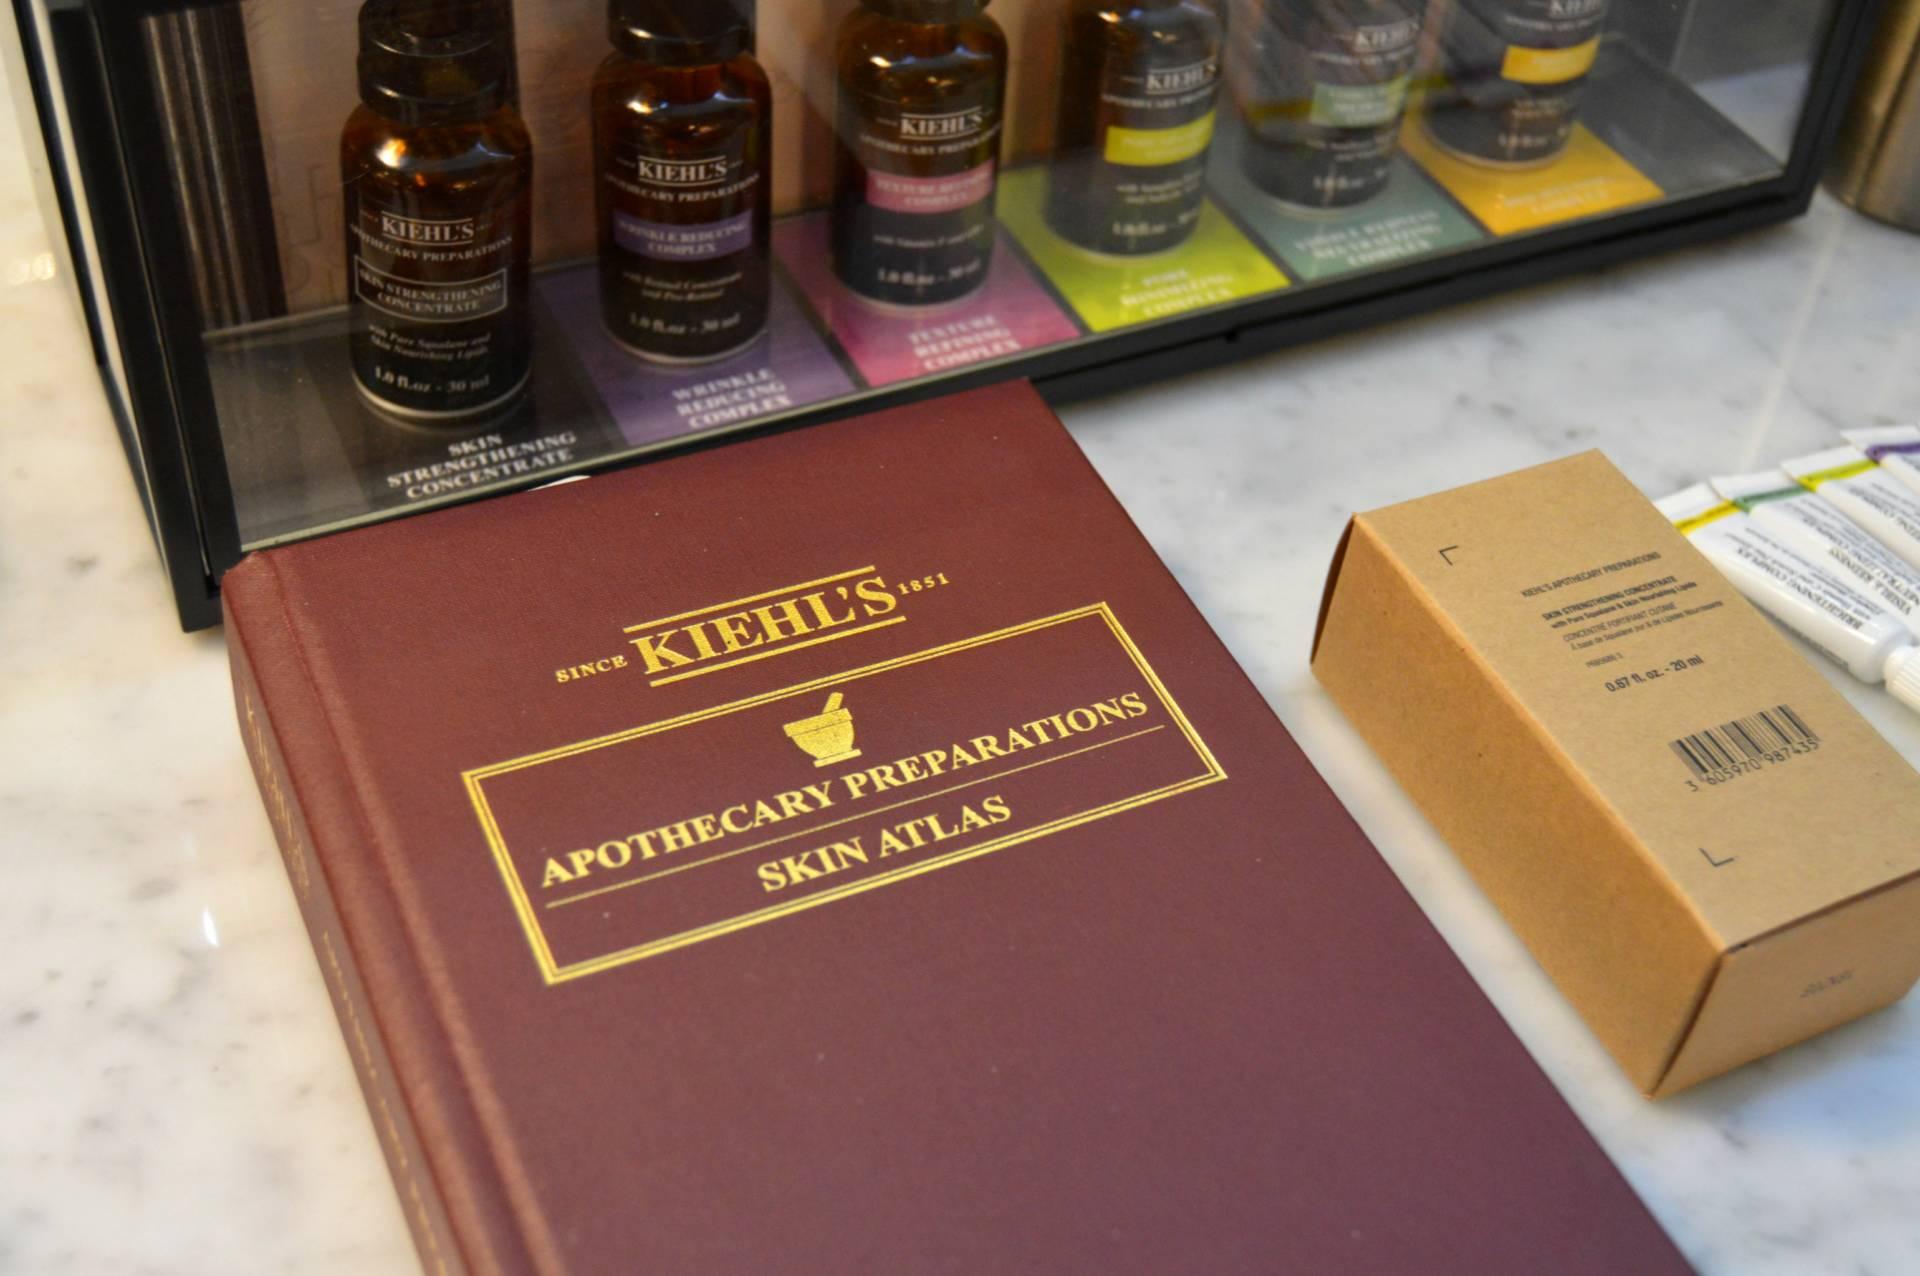 kiehls-apothecary-preparations-skin-atlas-inhautepursuit-review